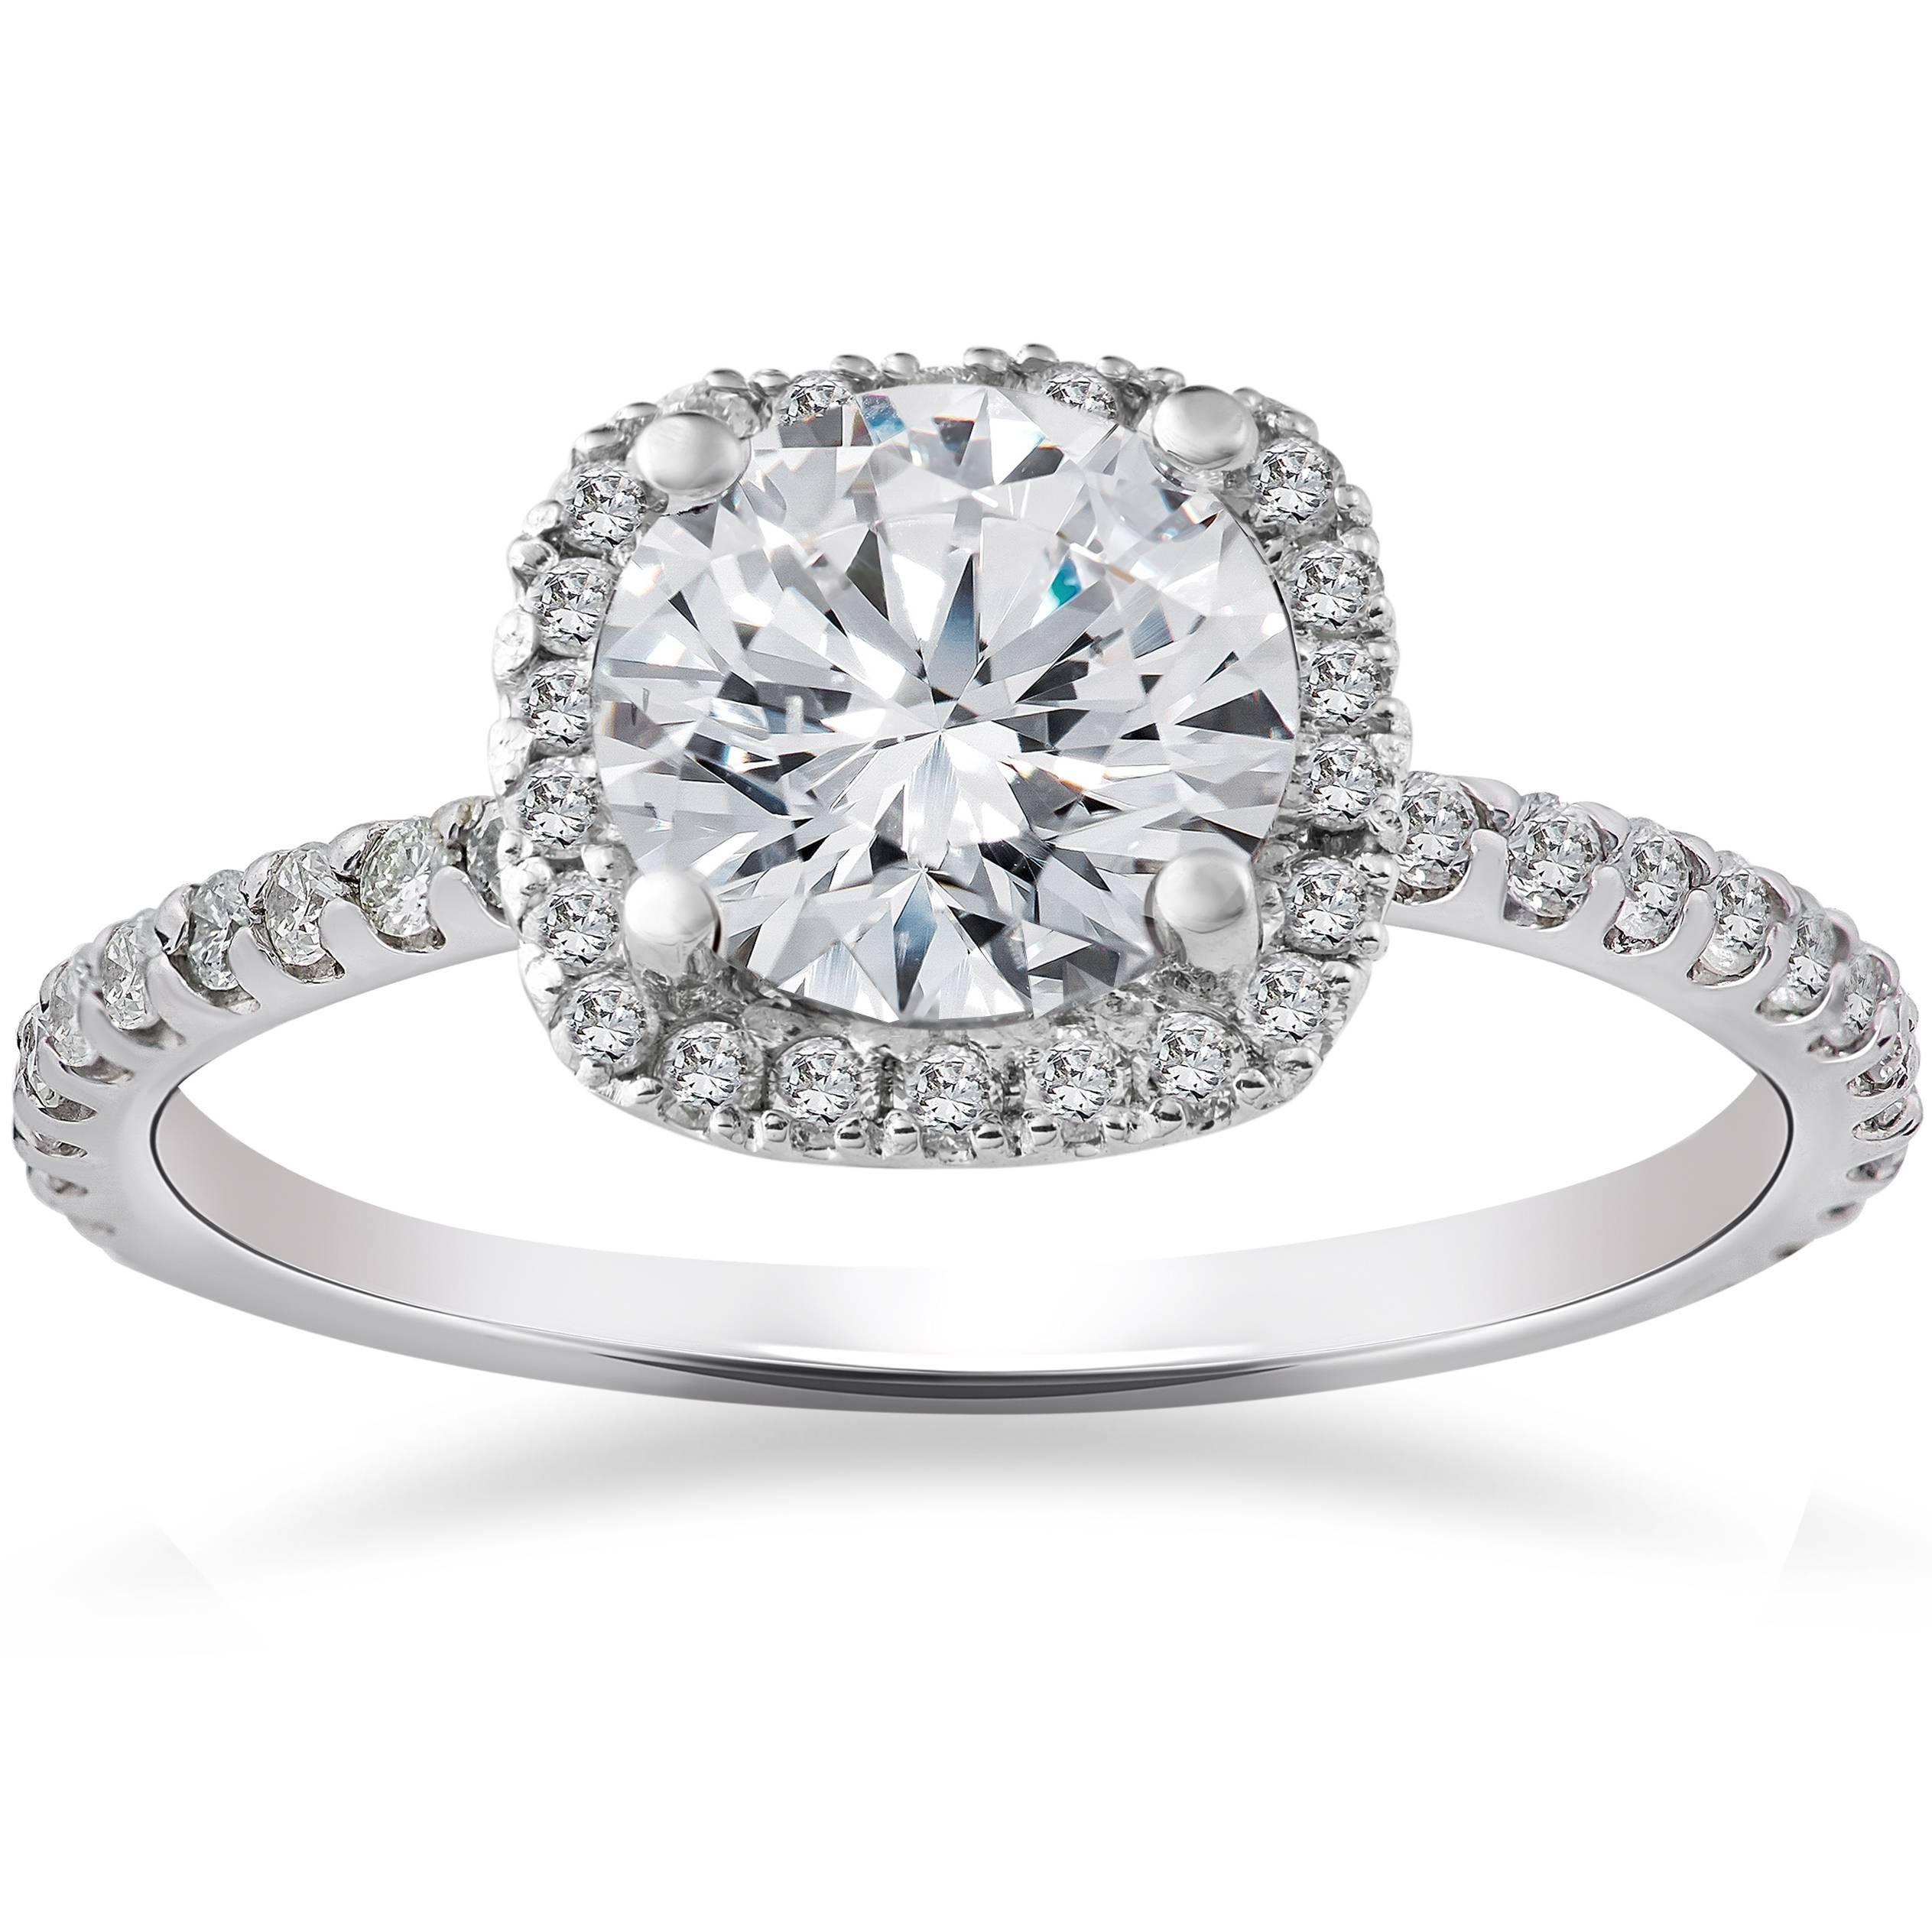 Details about 2 Carat Cushion Halo Enhanced Diamond Engagement Ring 14K  White Gold 023e4539bf